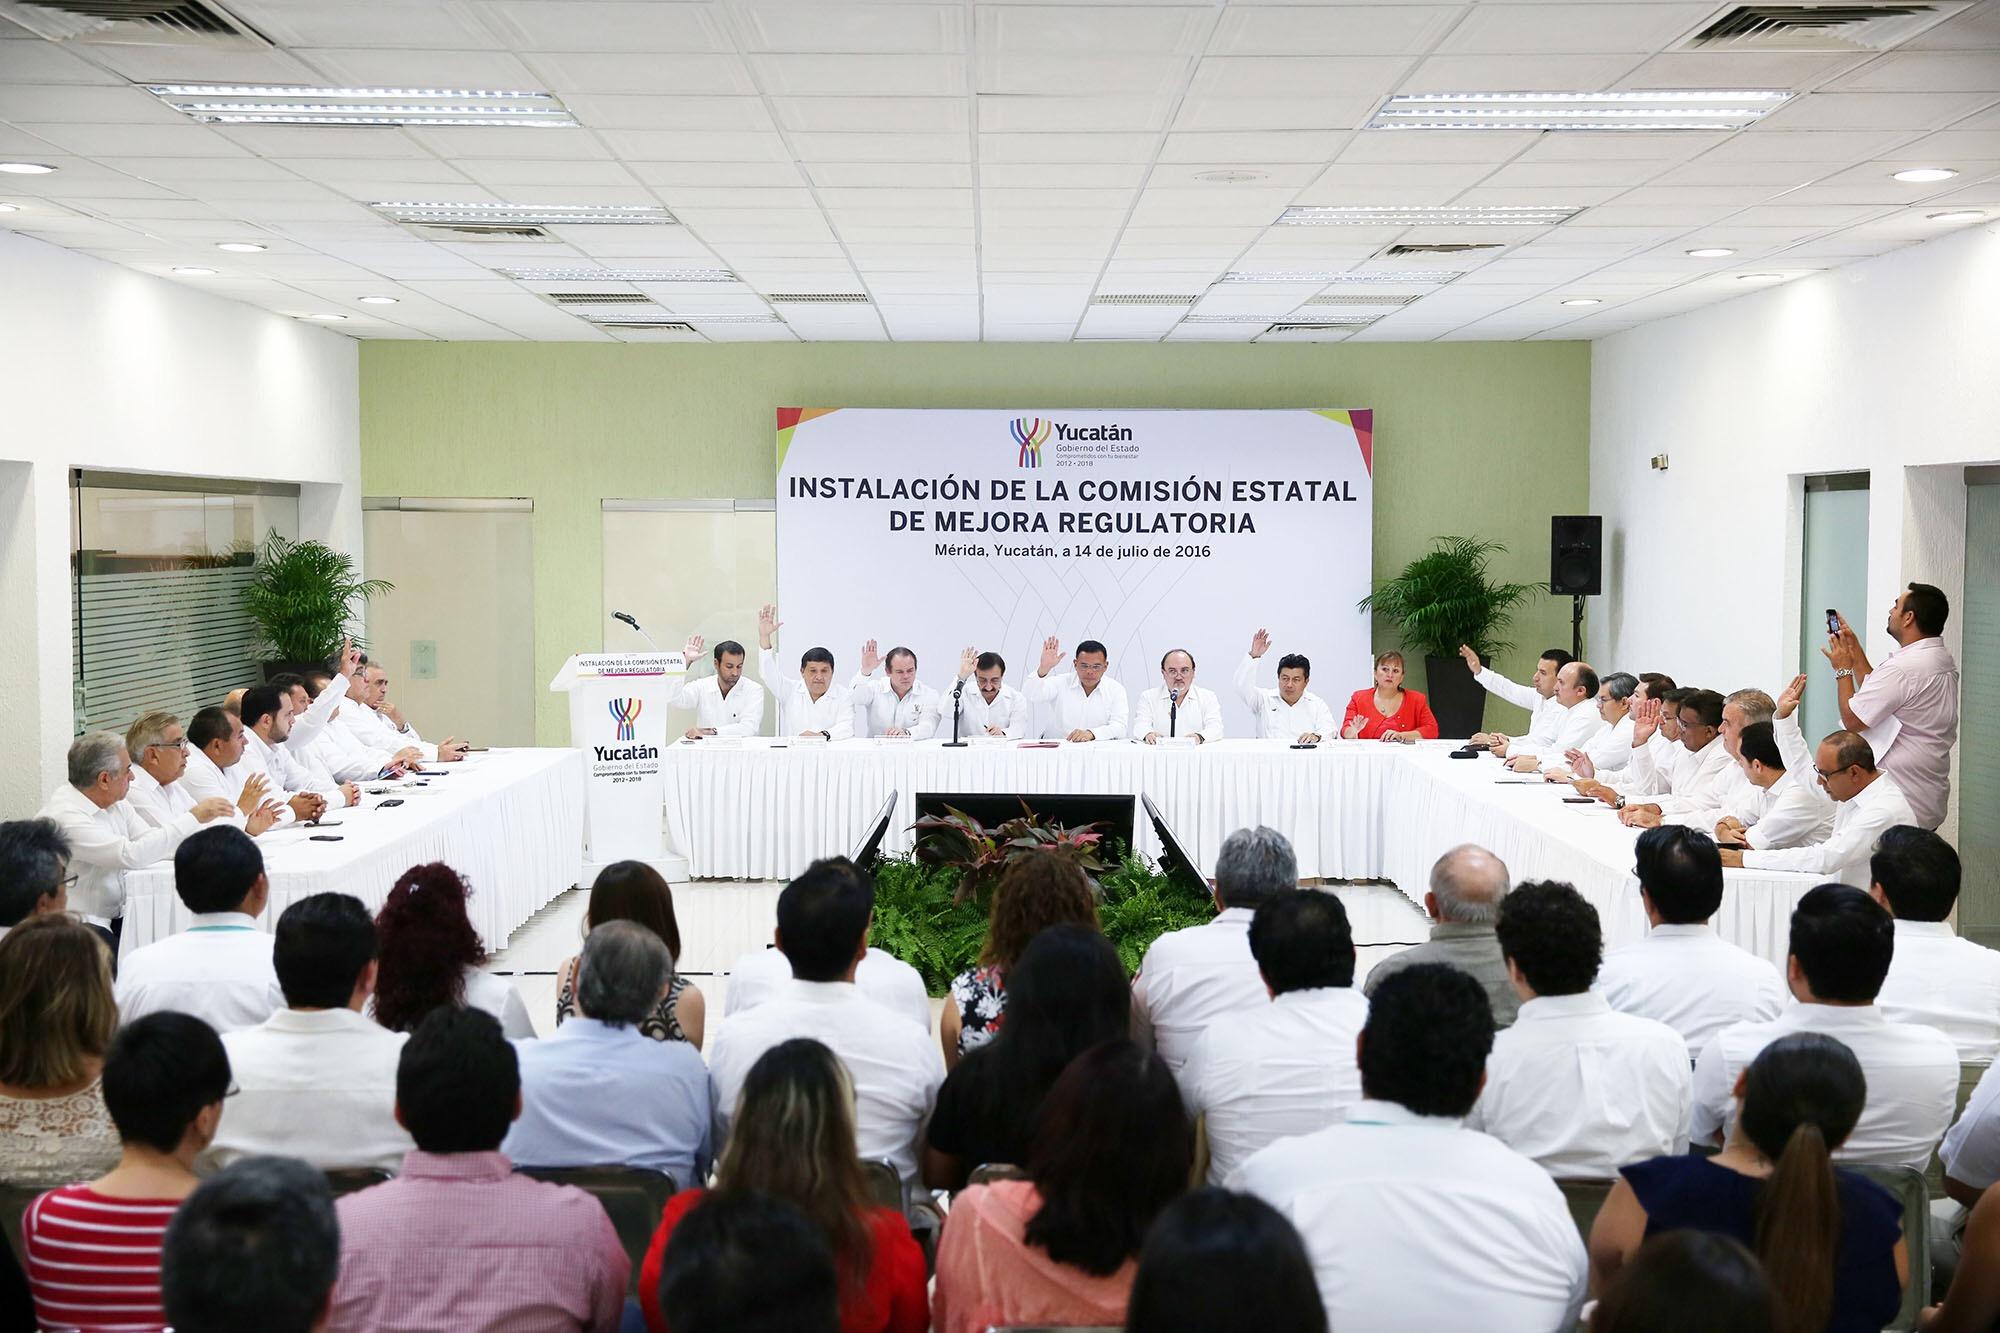 Instalan en Yucatán Comité de Mejora Regulatoria